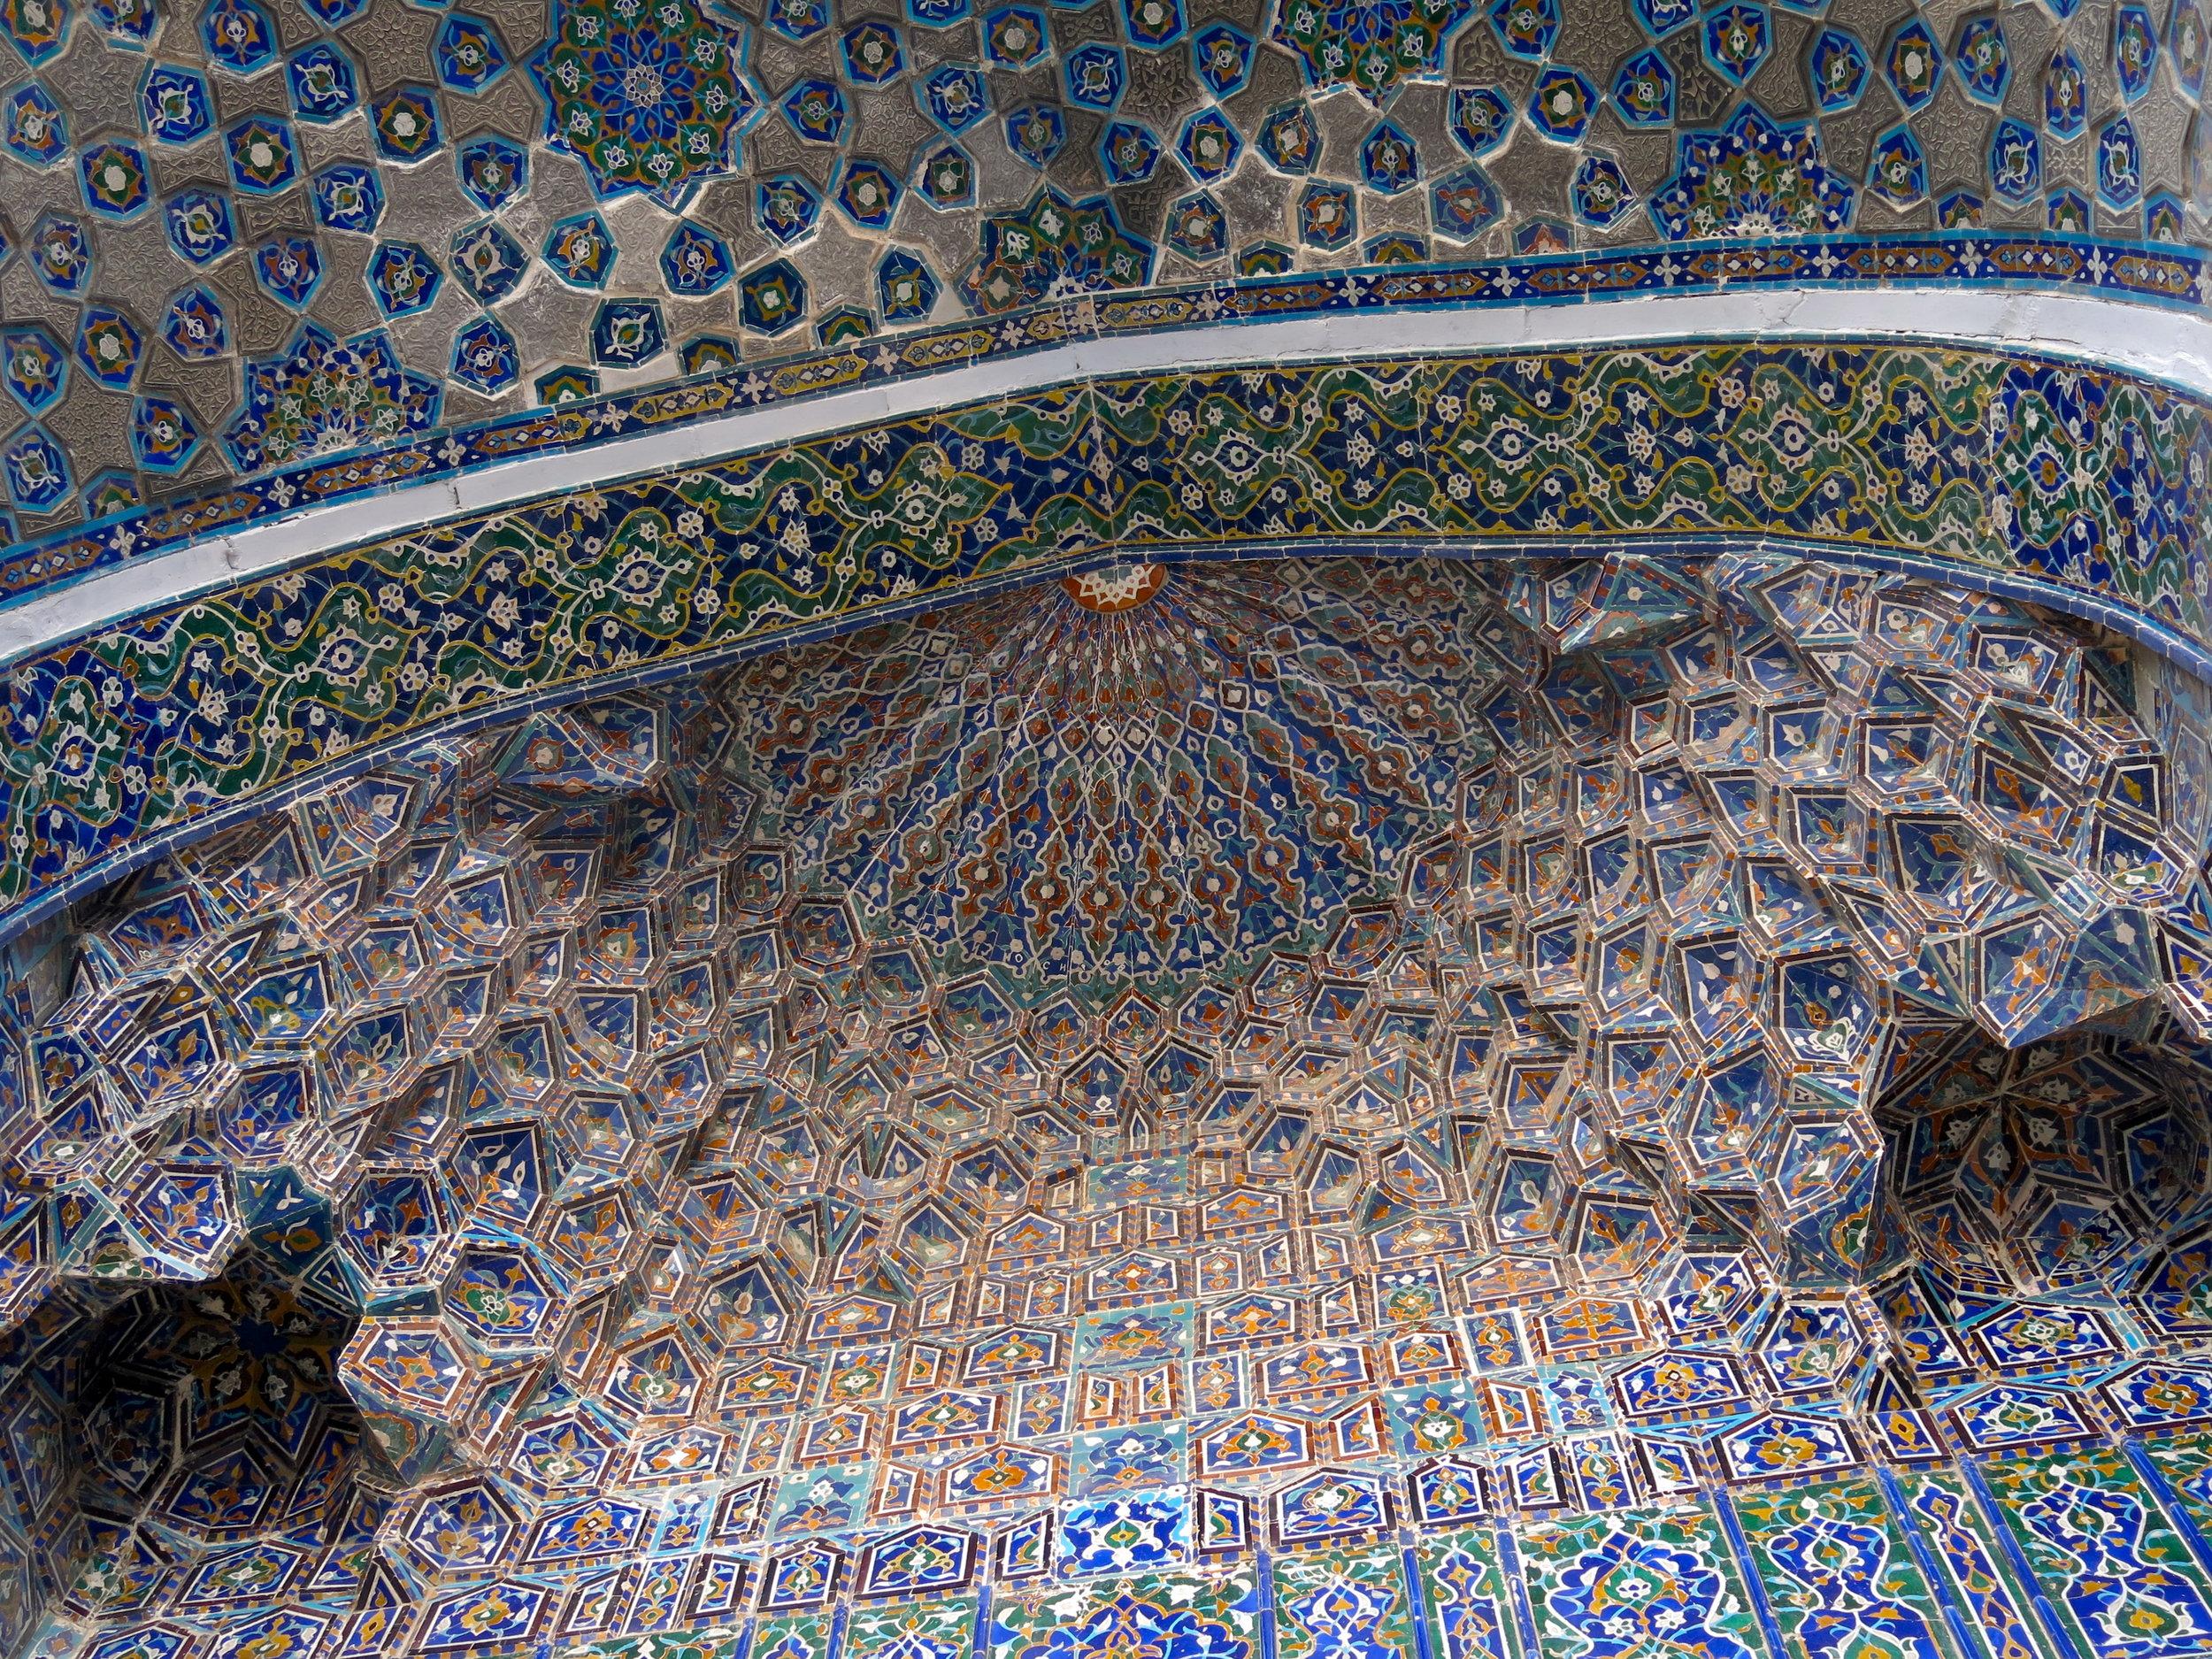 Another stunning set of muqarnas